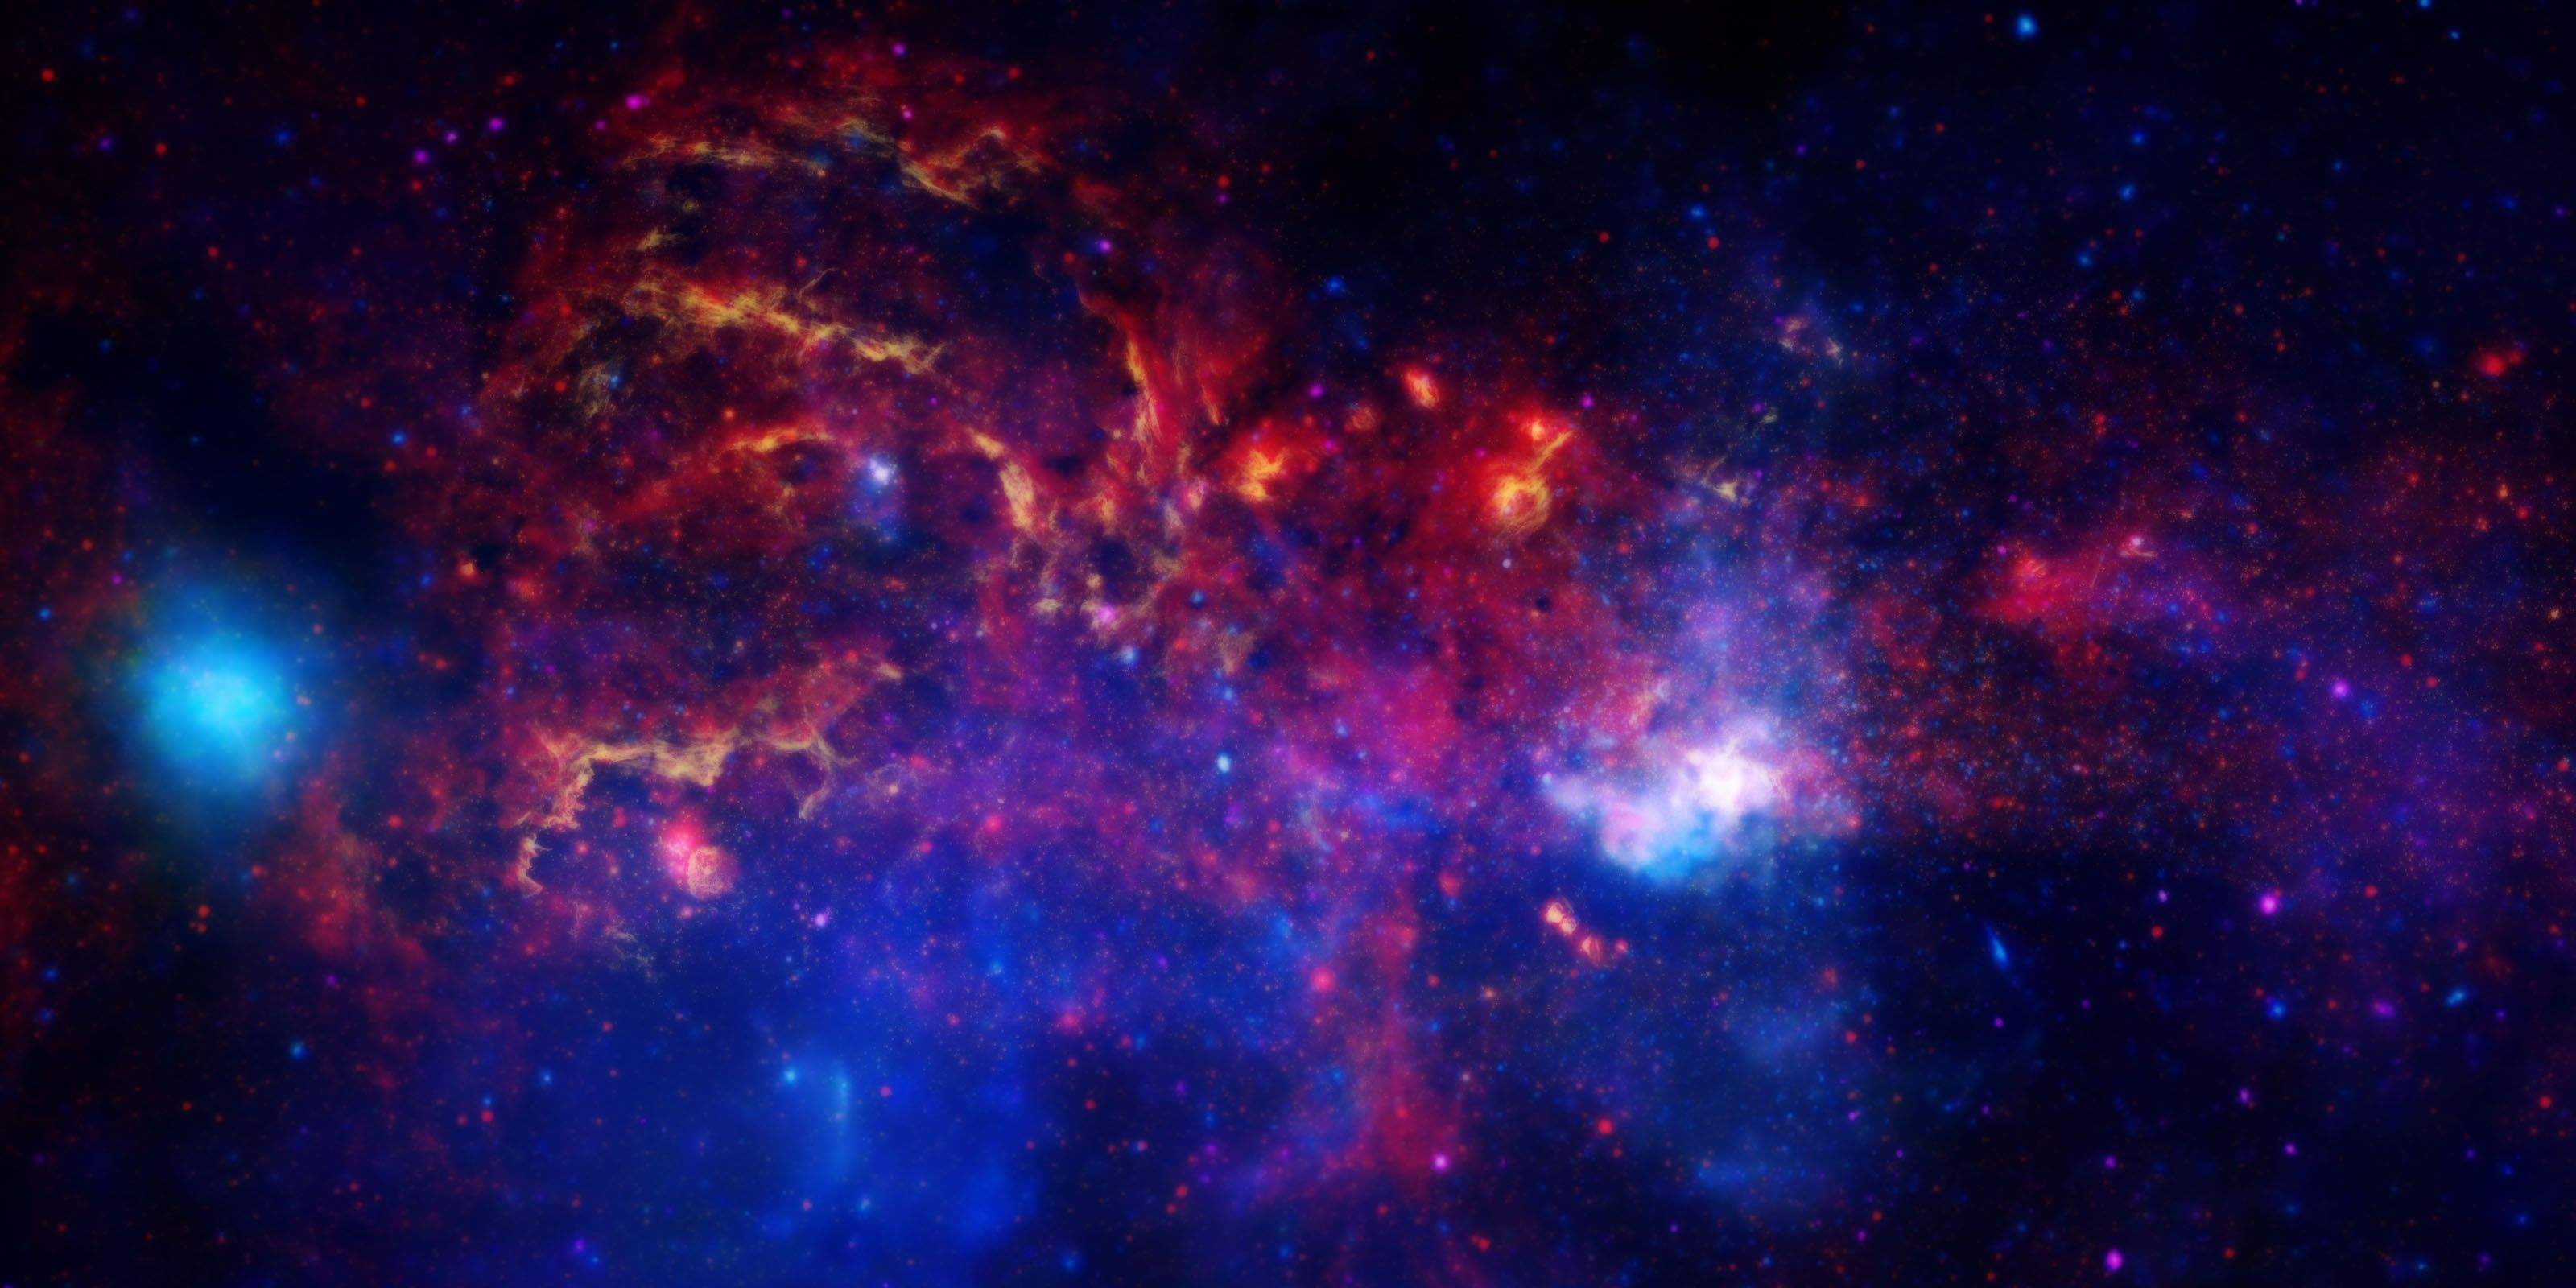 Download Wallpaper Horse Nebula - 275a1b1df46e460b8a69e284d1e40312  Perfect Image Reference_7937.jpg